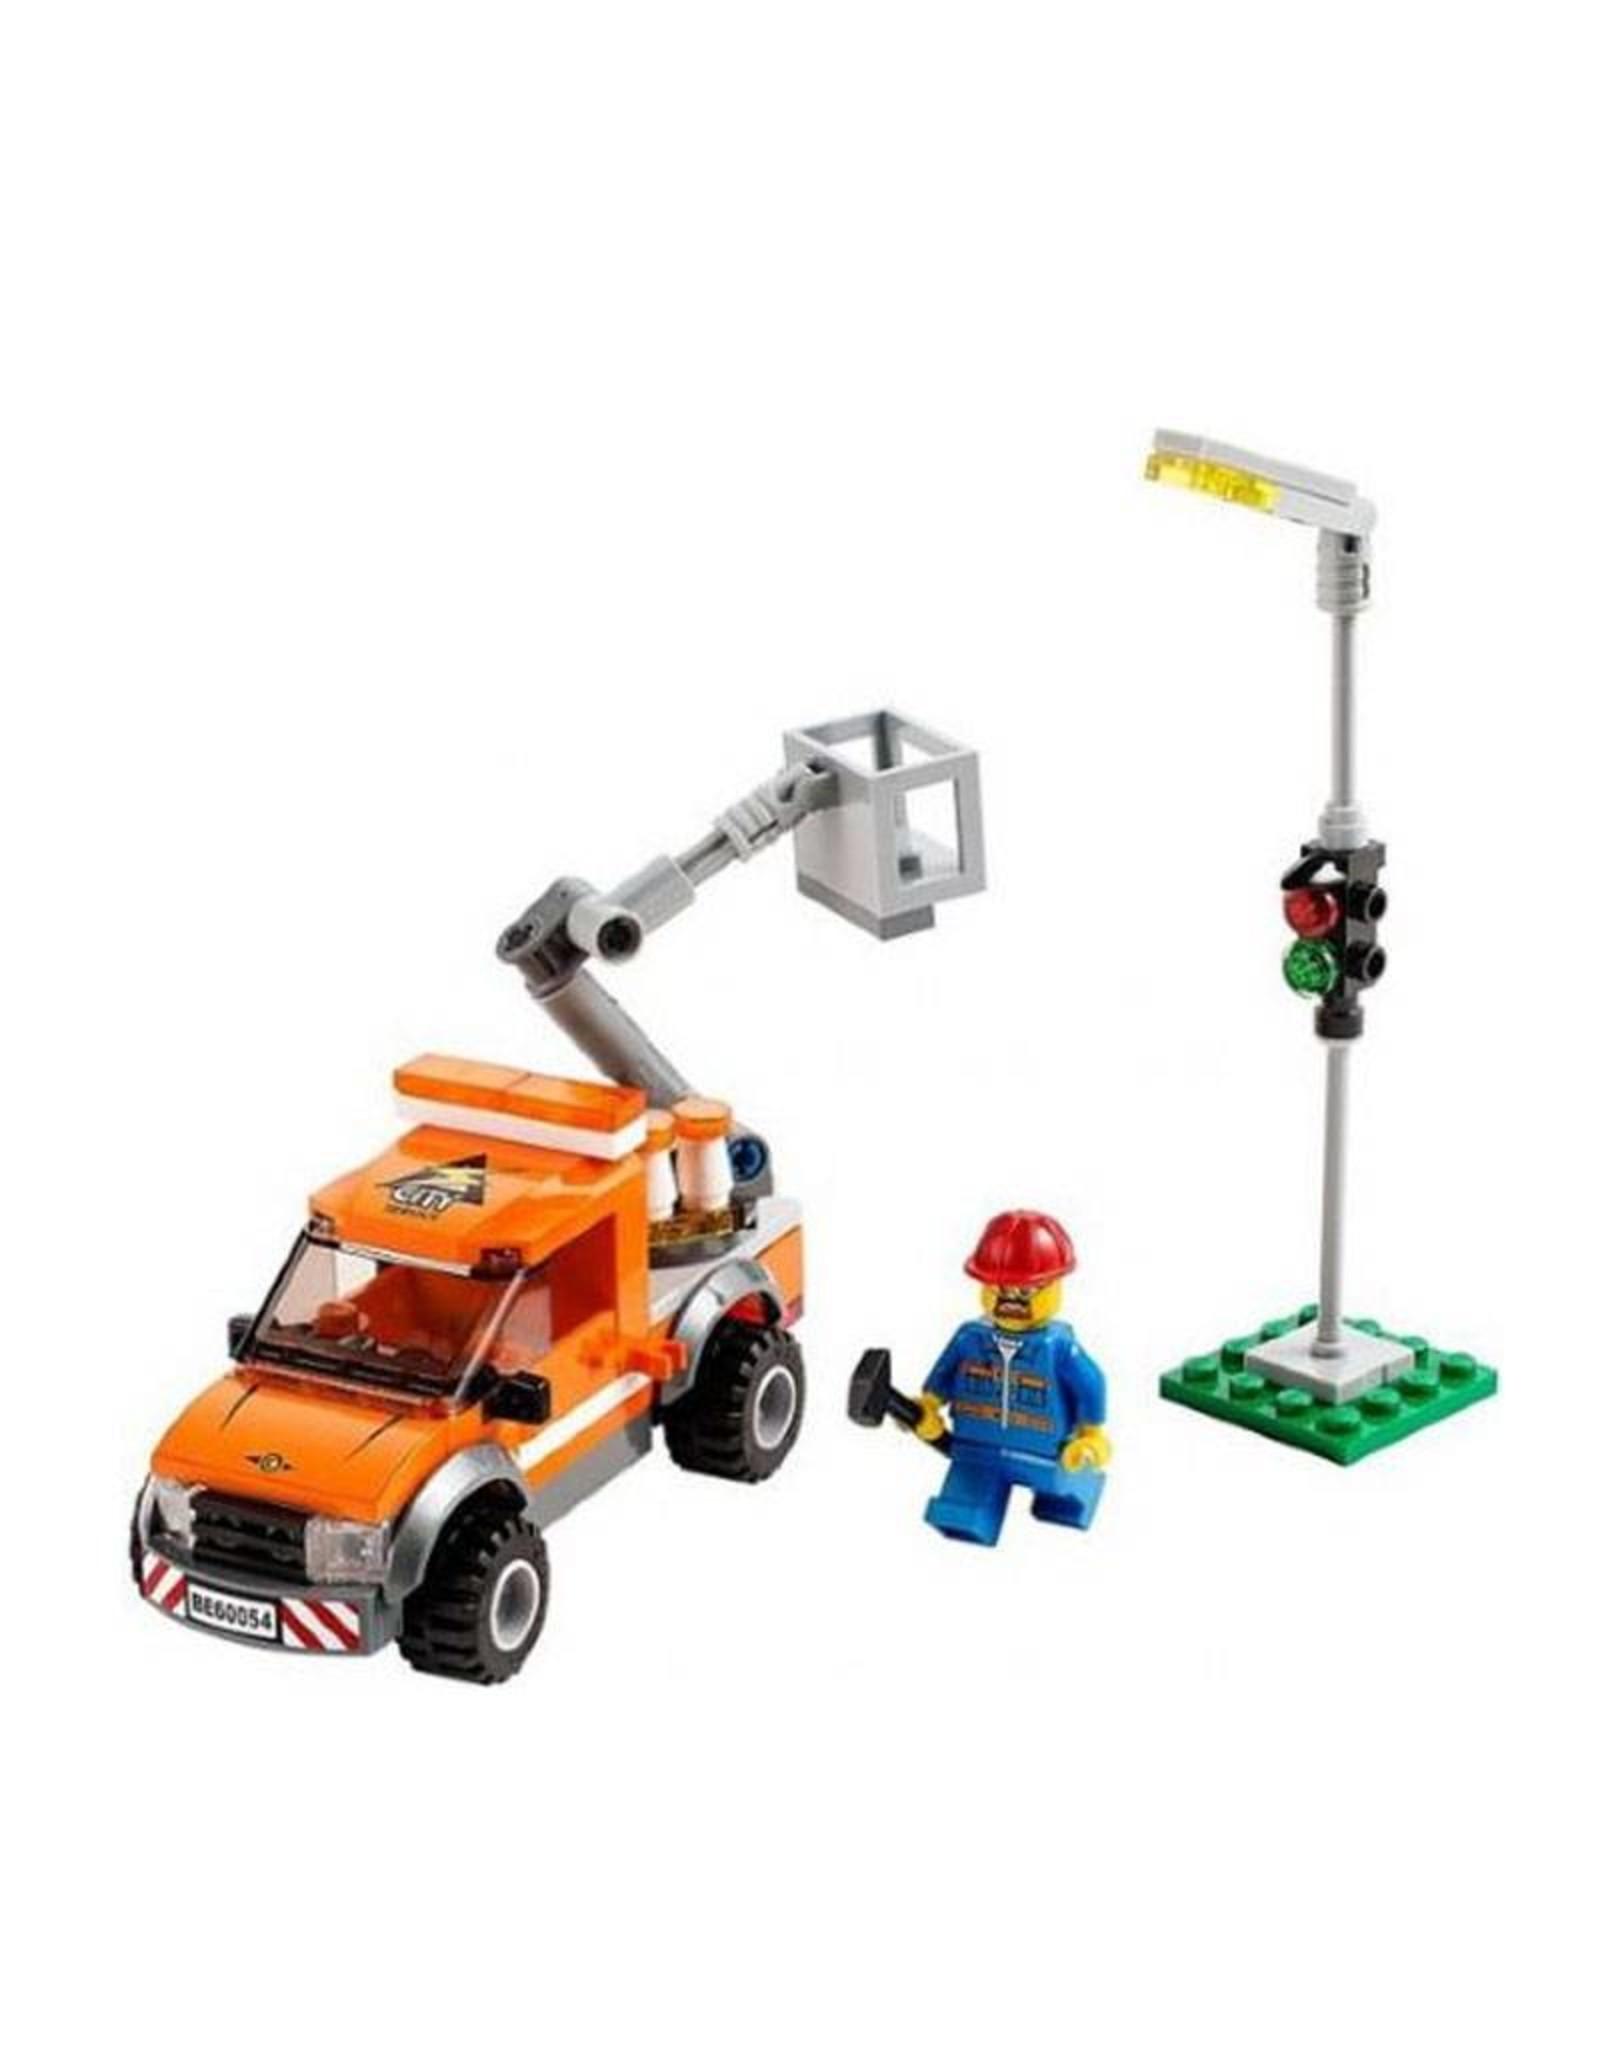 LEGO LEGO 60054 Light Repair Truck CITY